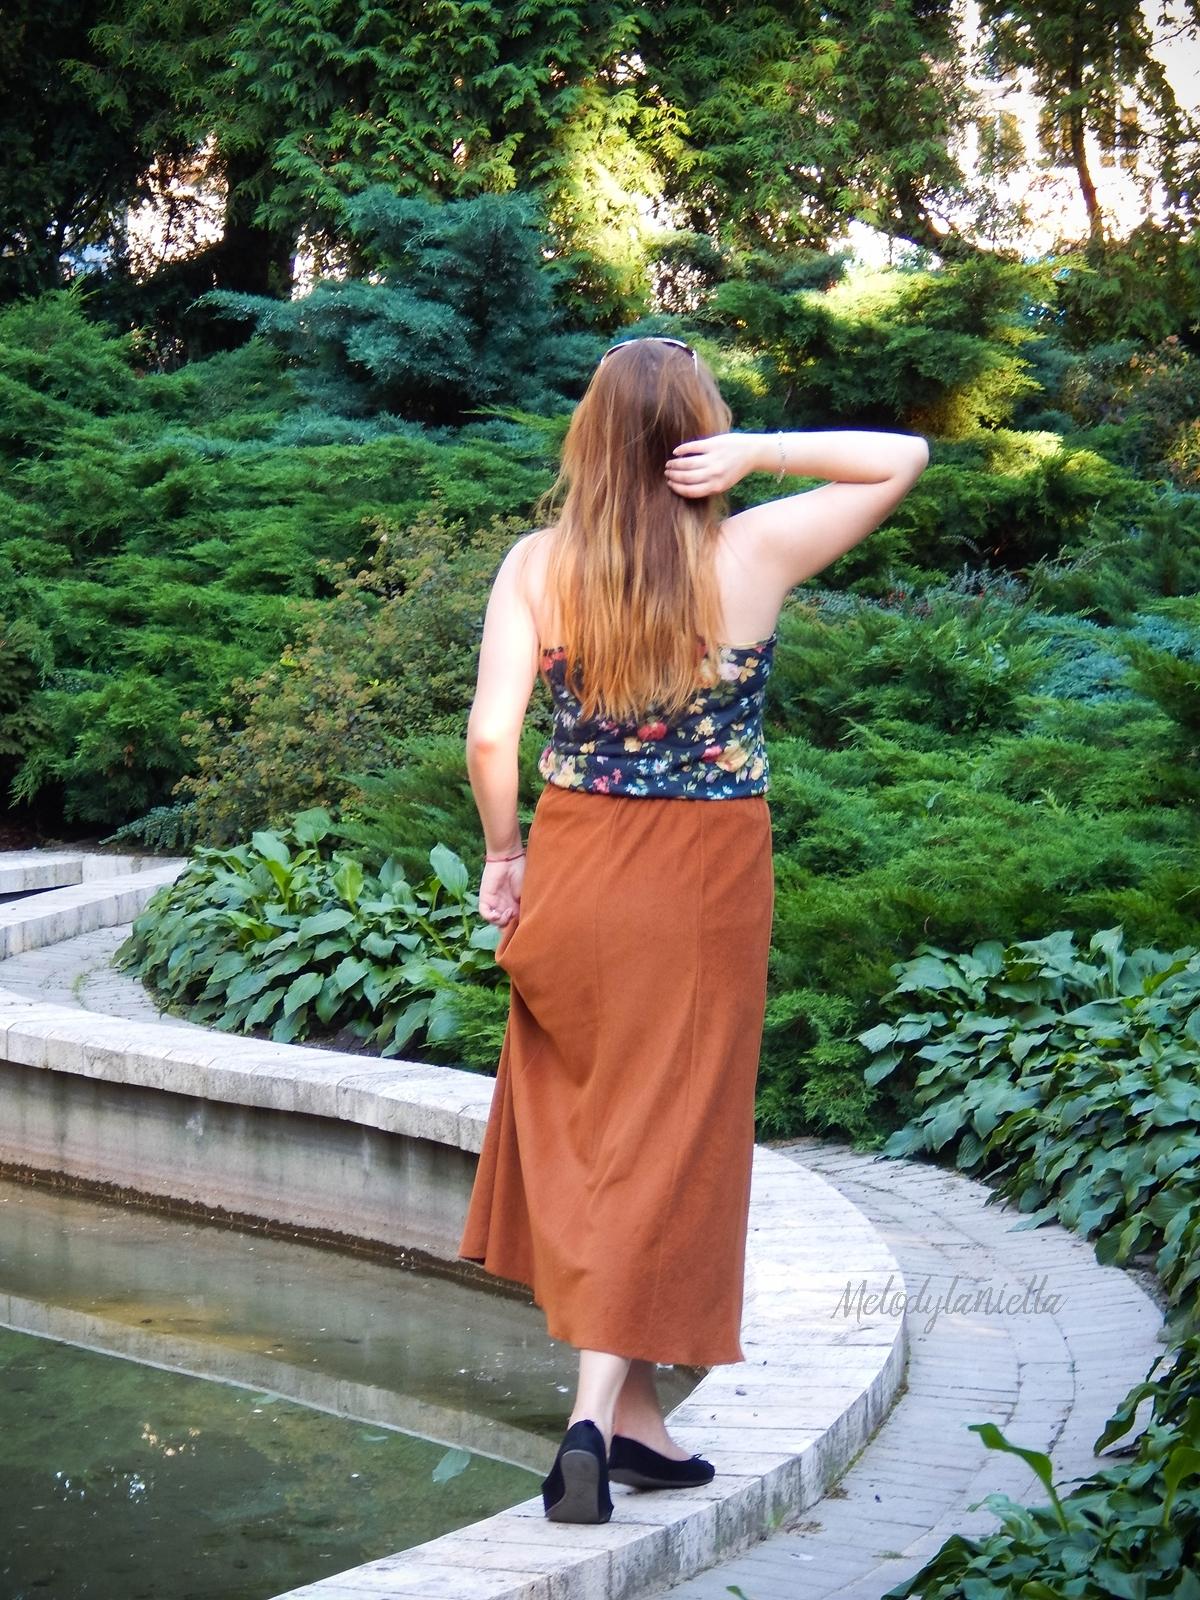 ruda spodnica mamy kolorowy top river islands czarna torebka manzana lookbook na jesien maxi